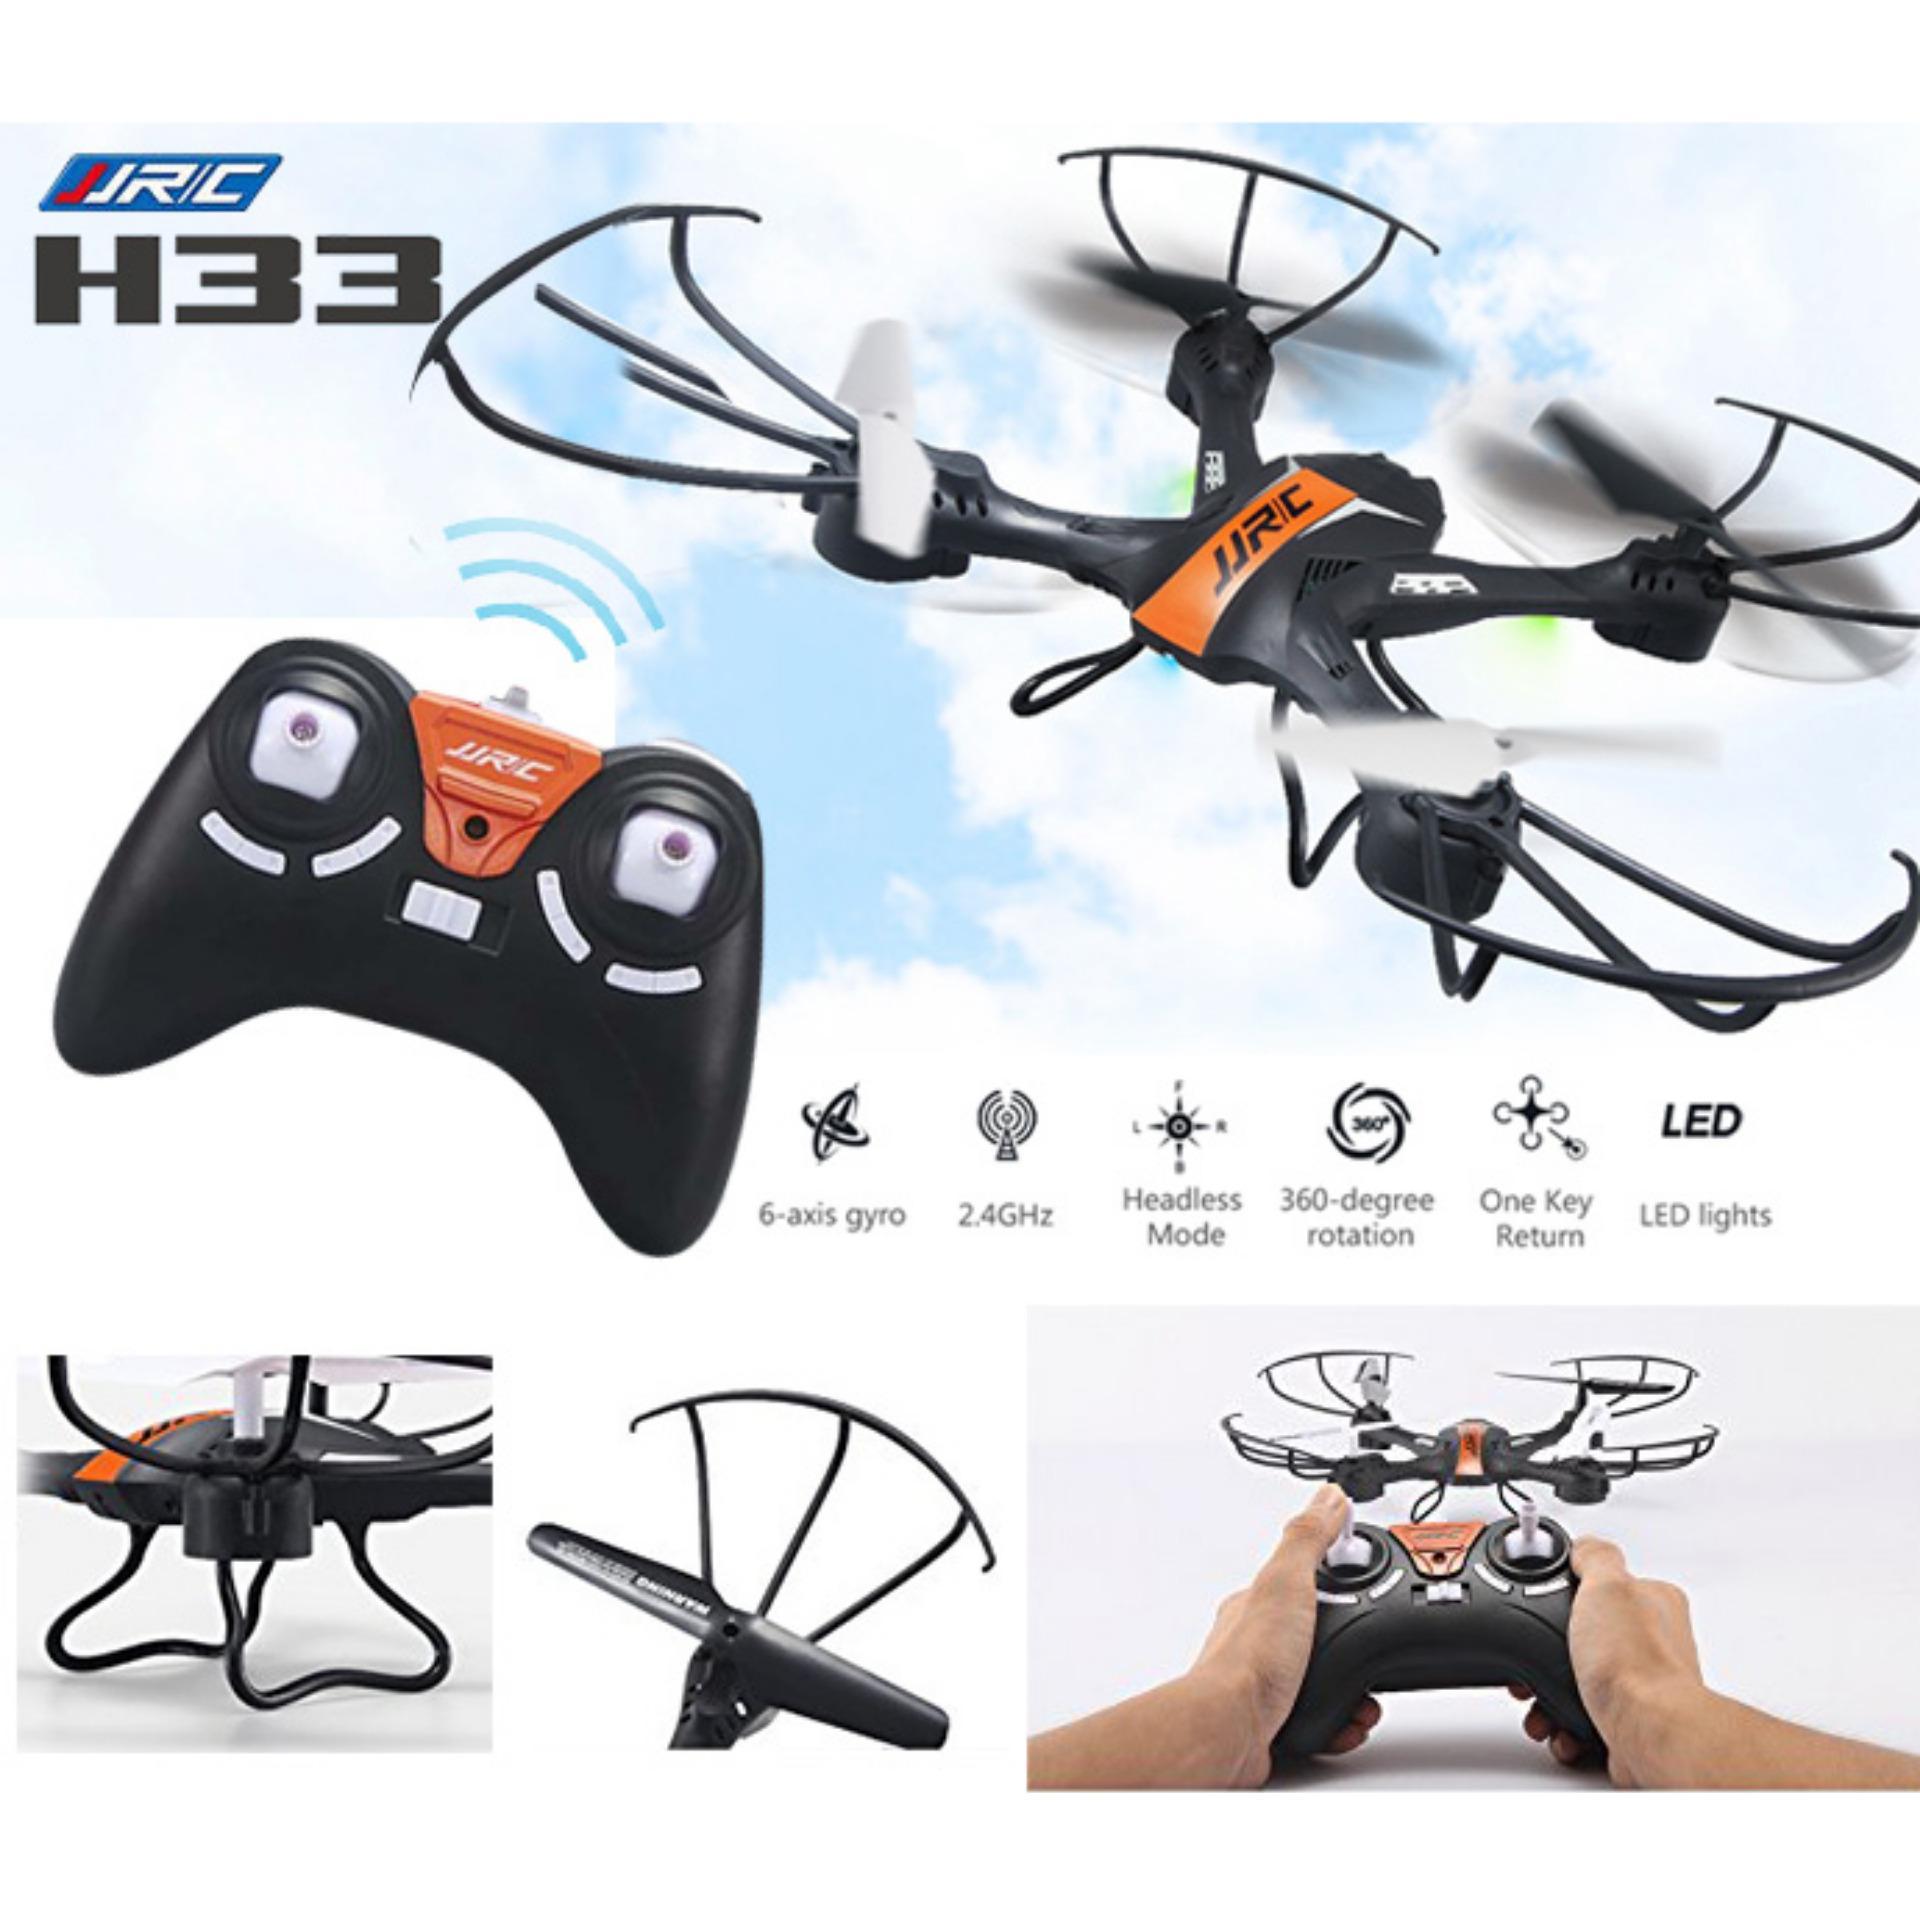 Blackhawk Fh222 4 Ch 6 Axis Micro Drone W Headless Mode One Key Tarantula Sq800 With Camera Quadcoper Hanya Kena 1kilo Jjrc H33 Rc Quadcopter 24g Channel Dengan Fitur